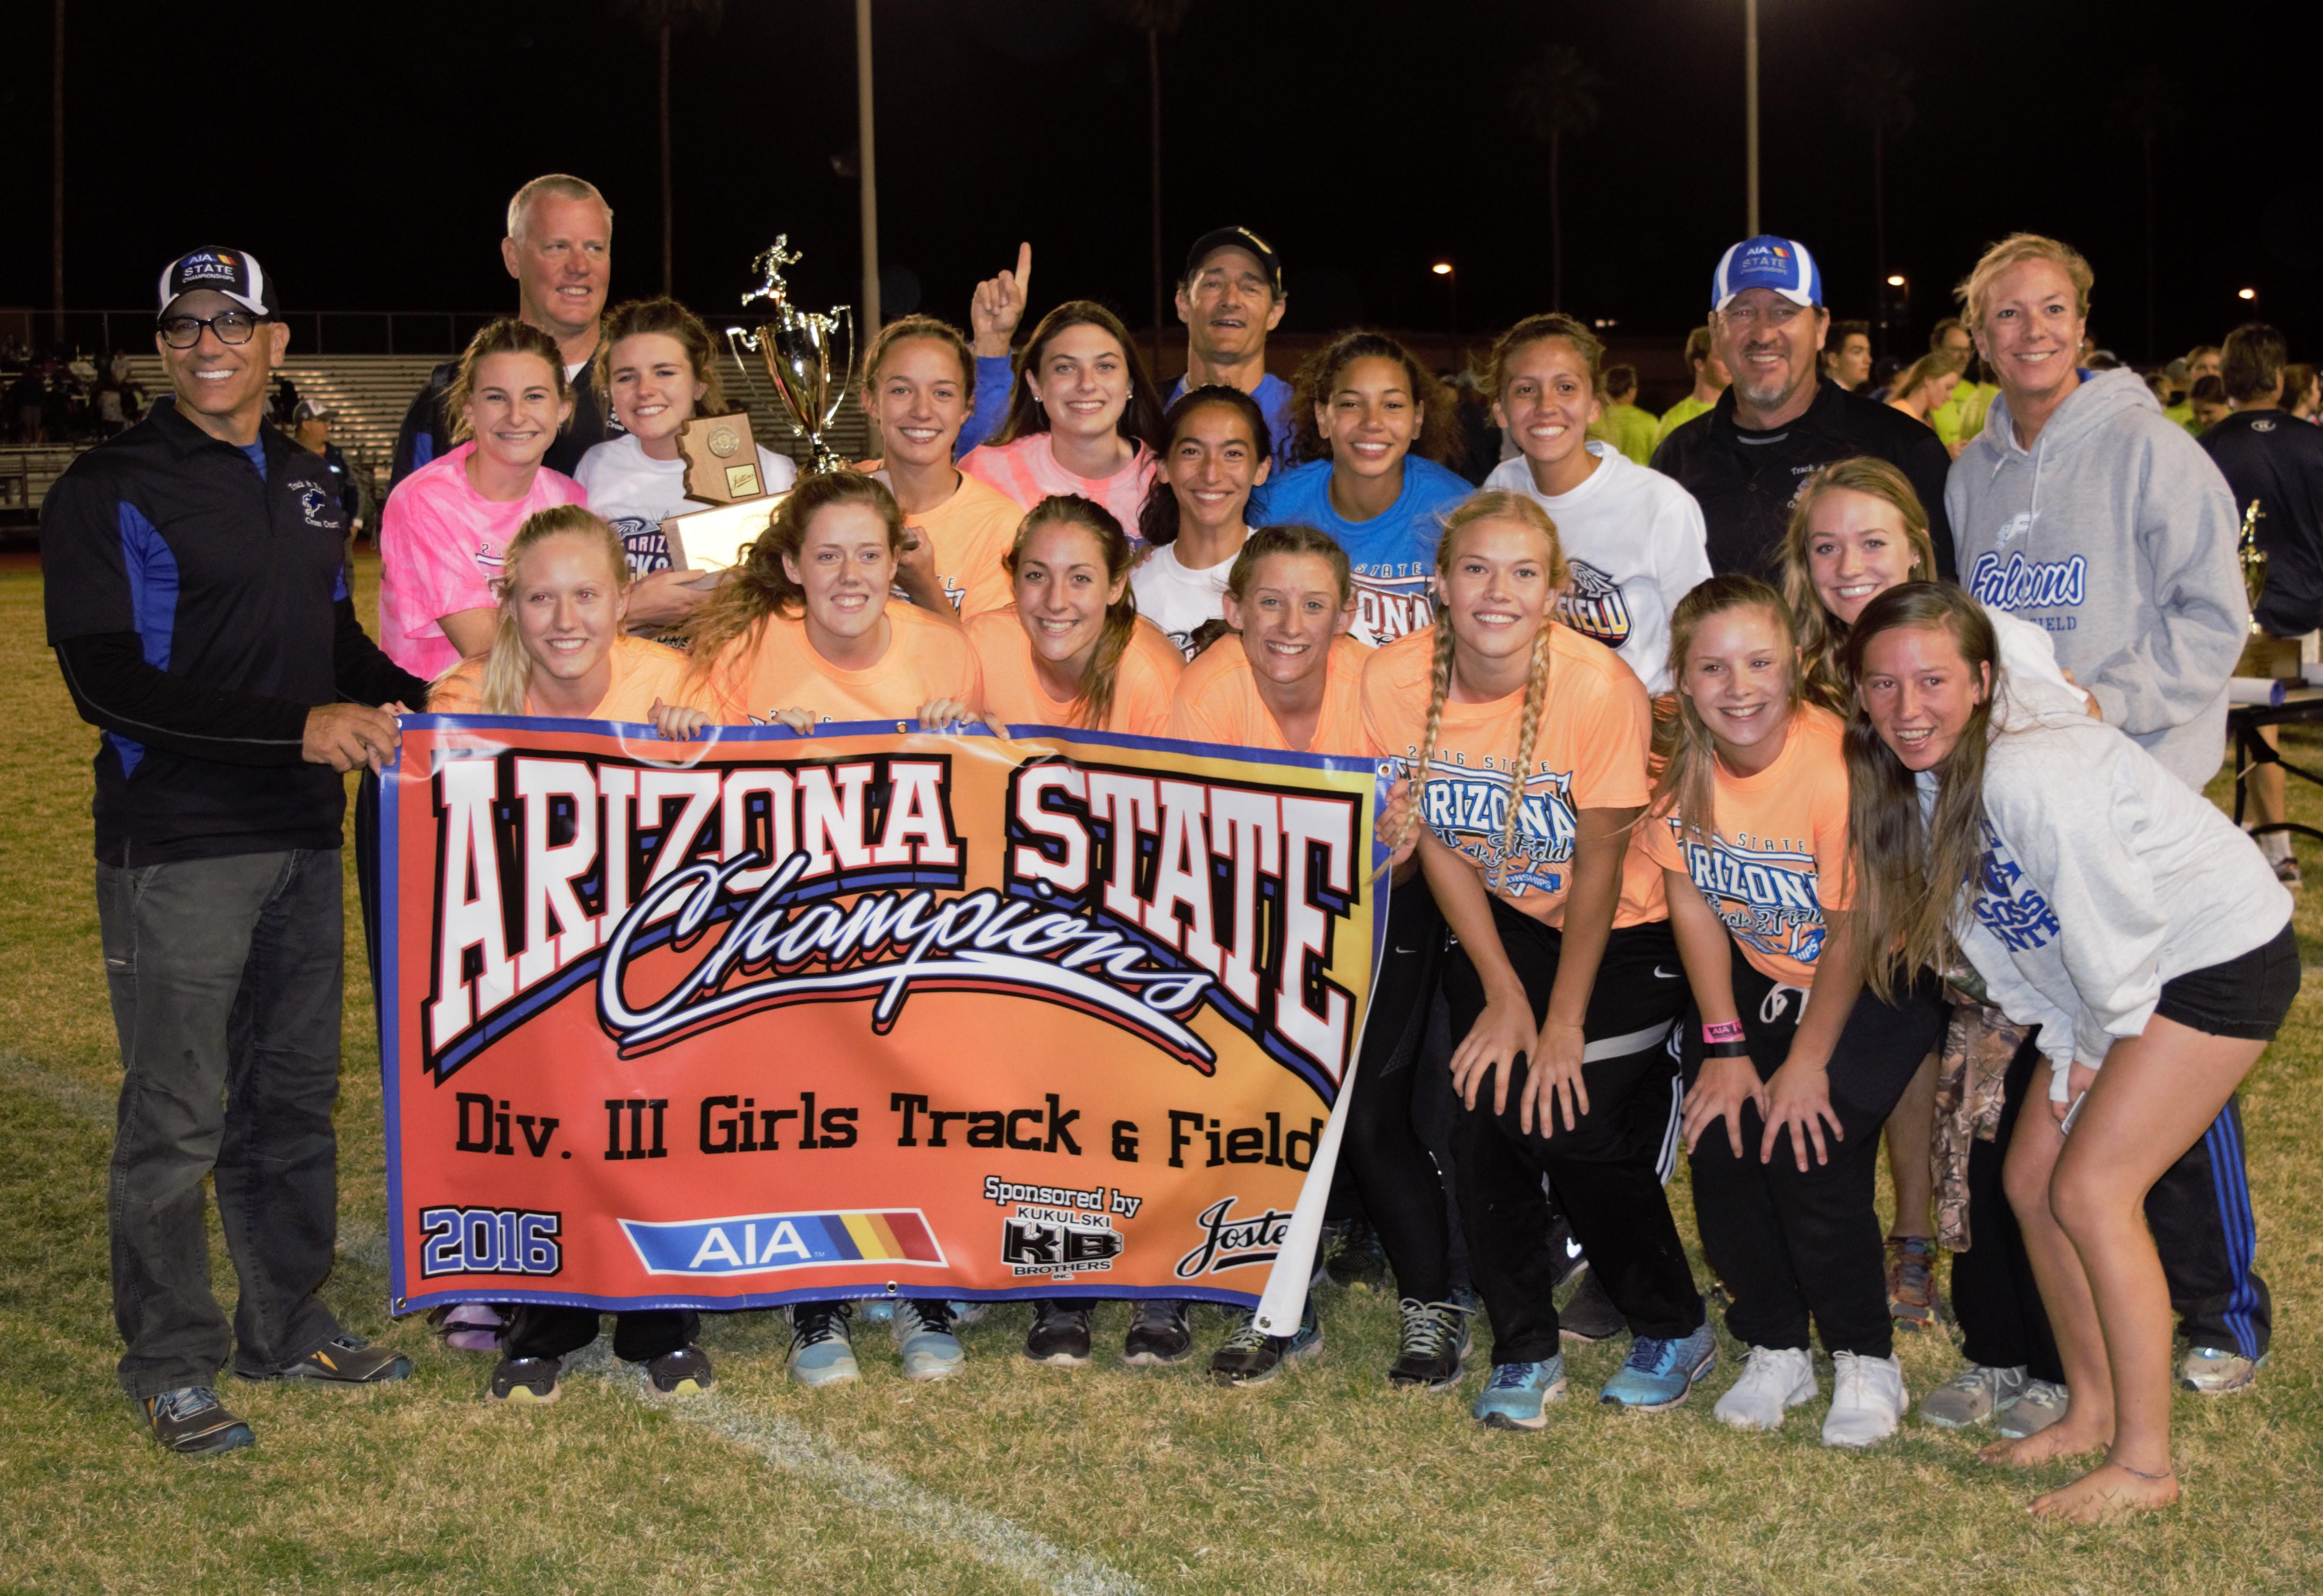 track team photo state champions 2016